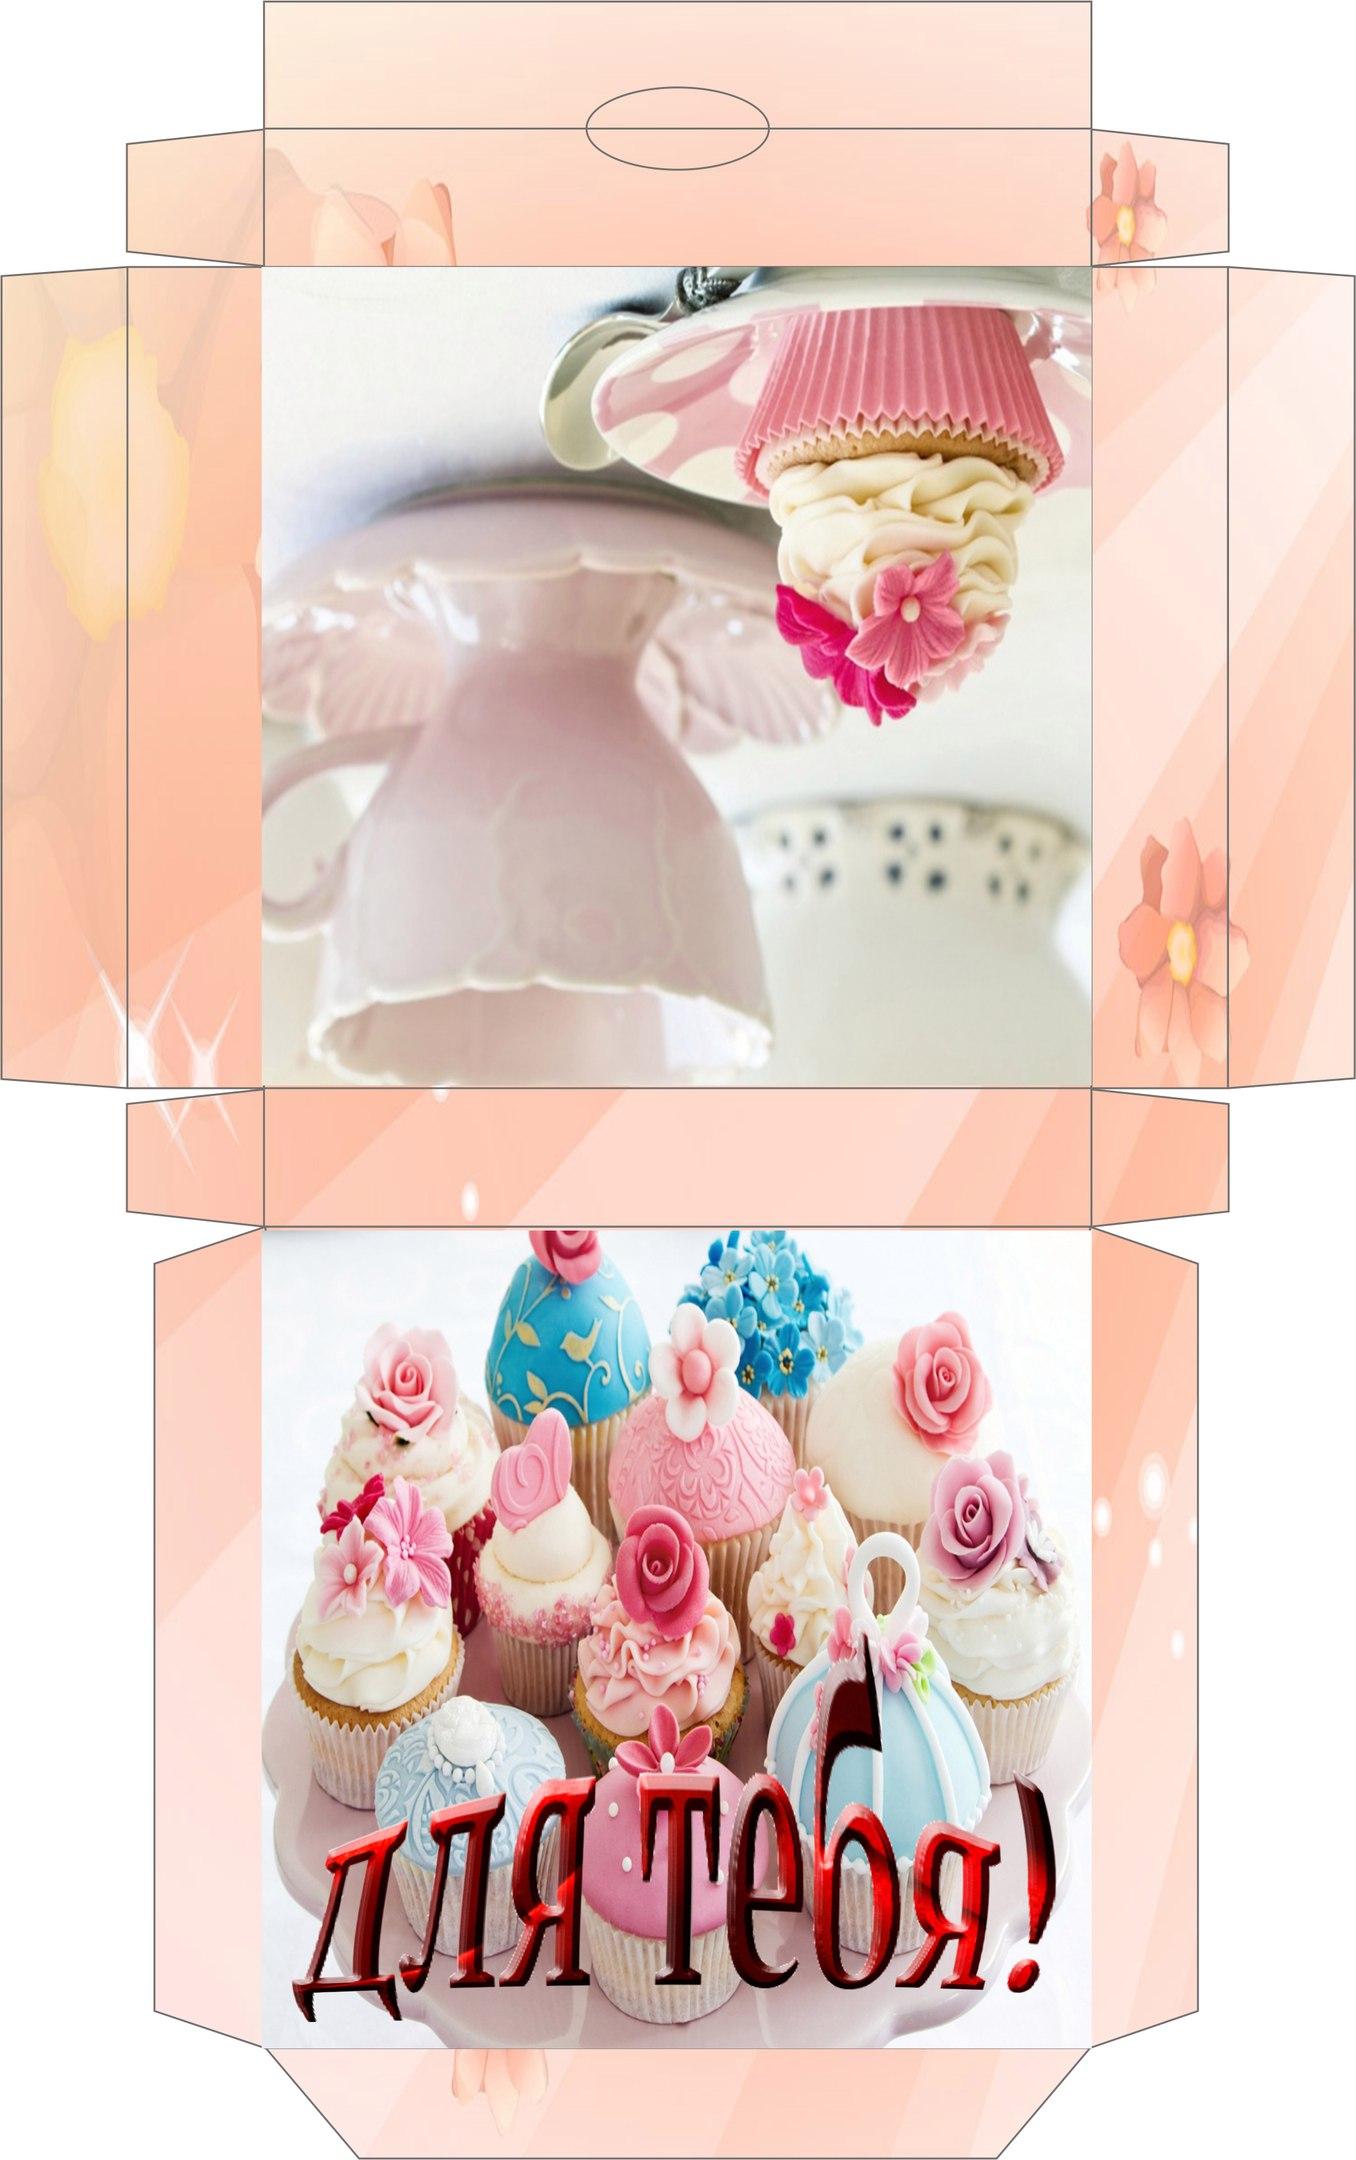 Шаблон шокобокса с пирожными